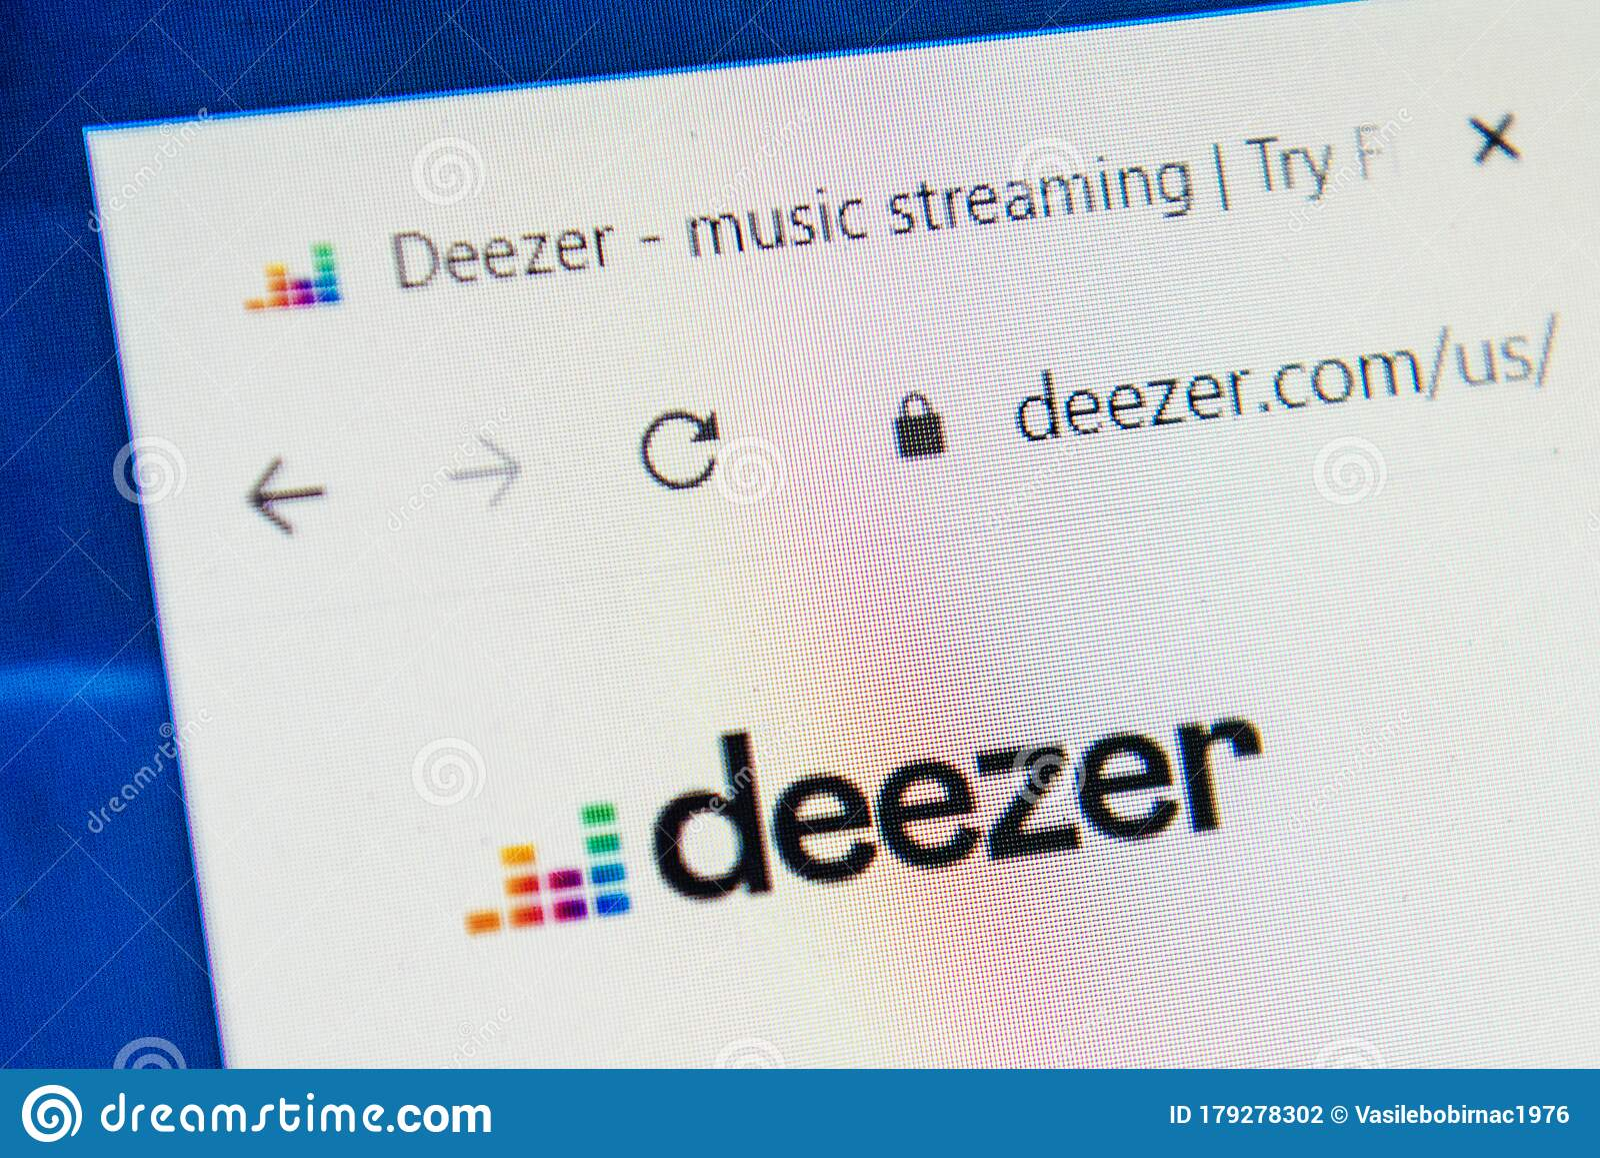 Deezer Com Web Site Selective Focus Editorial Photography Image Of Internet Home 179278302